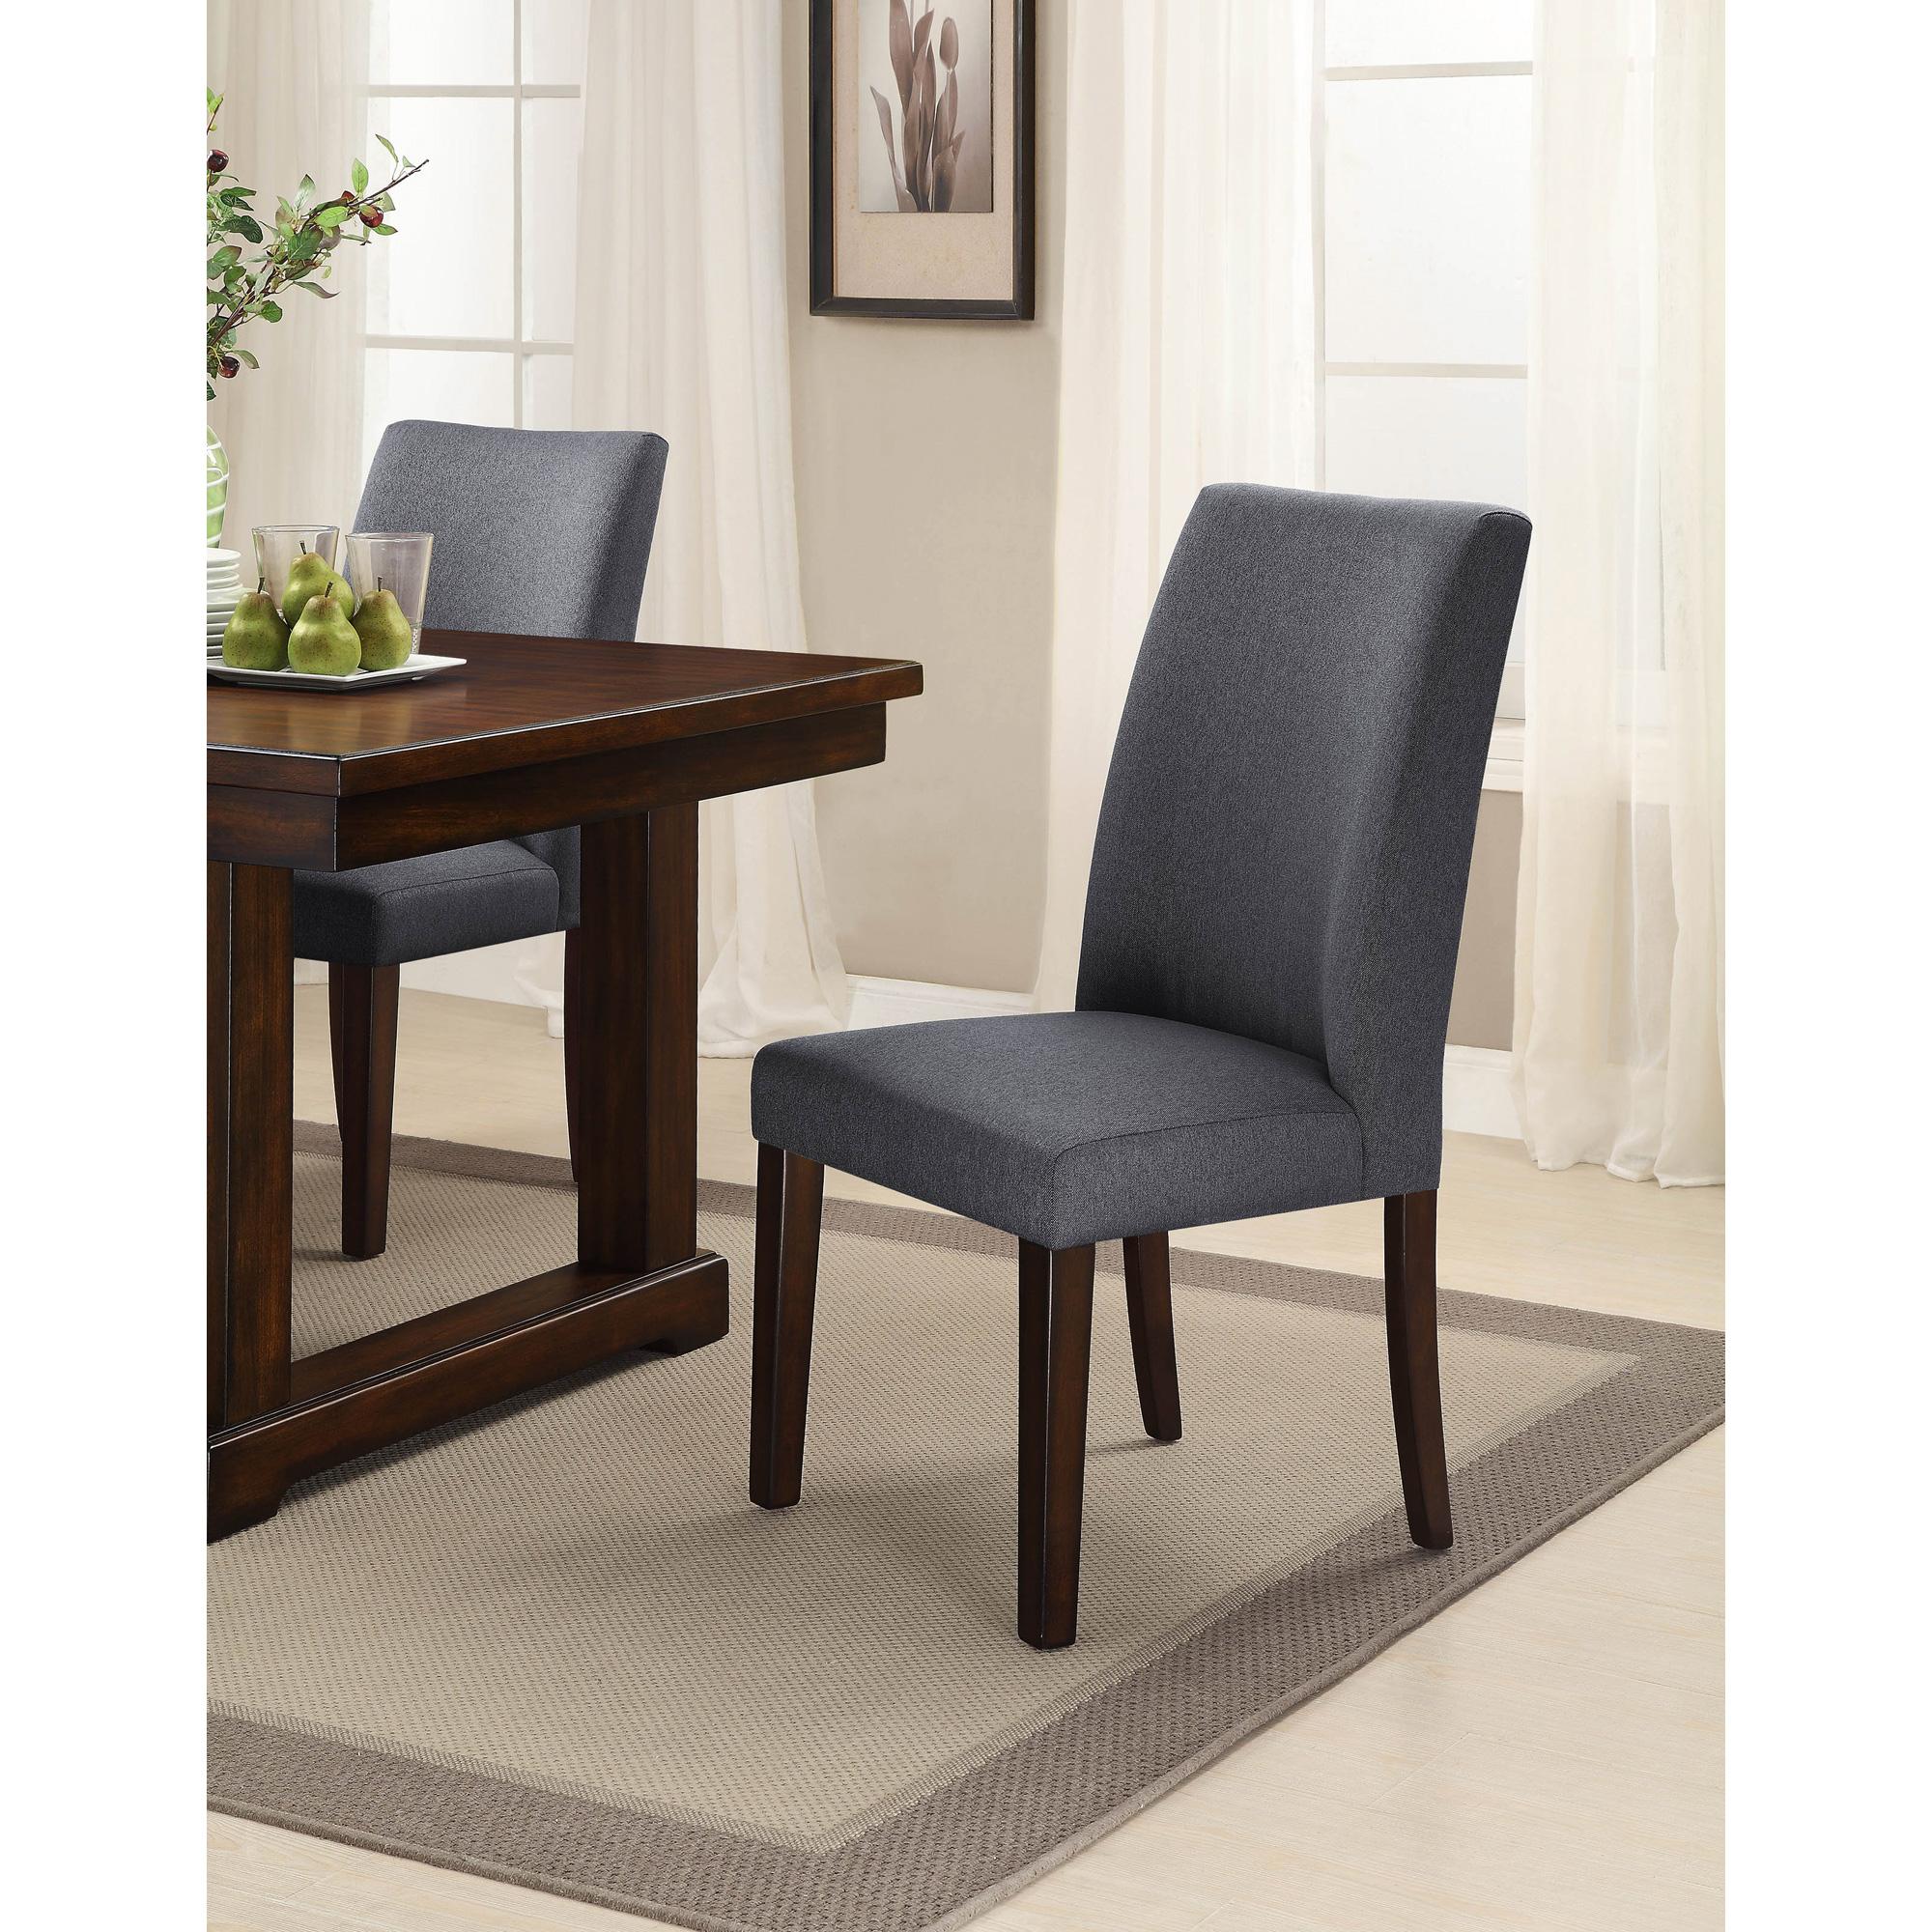 Apam | Graystone Espresso Dining Chair